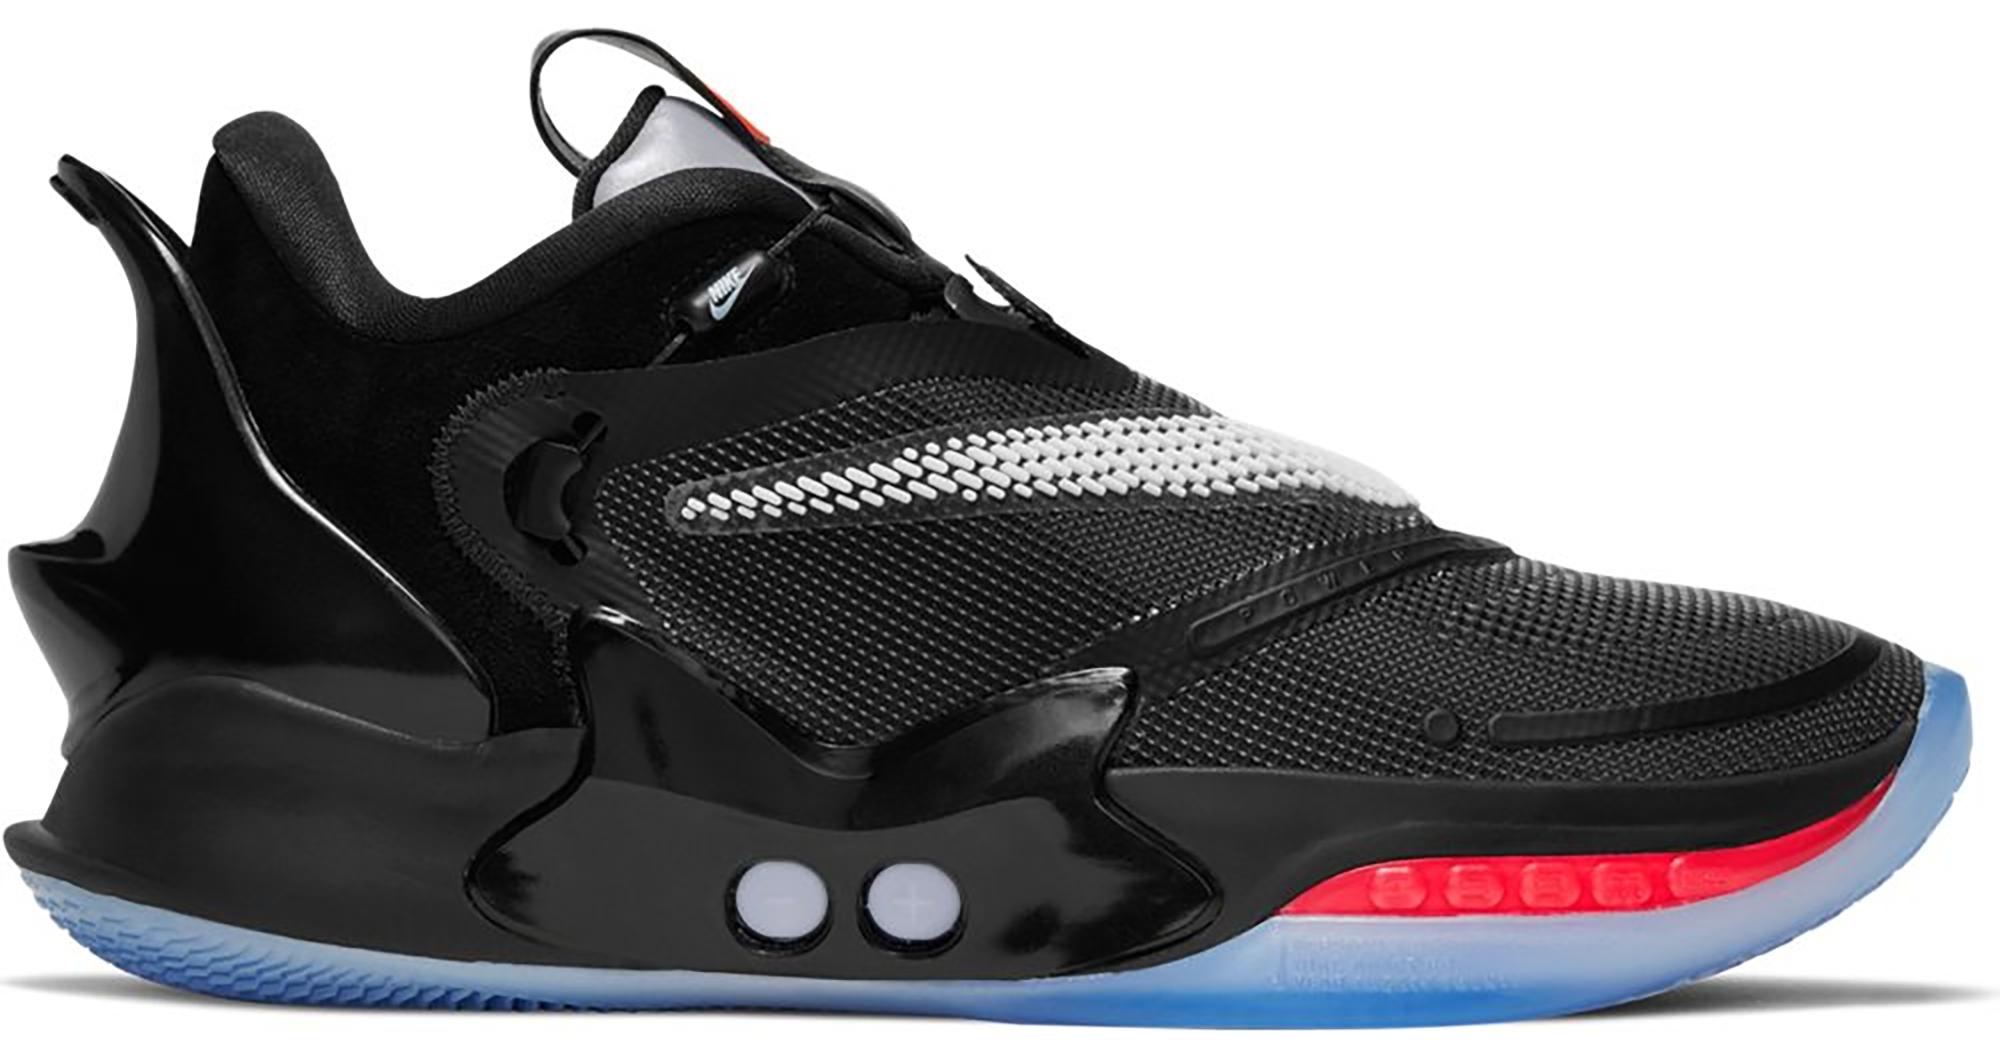 Nike Adapt BB 2.0 Black (Other